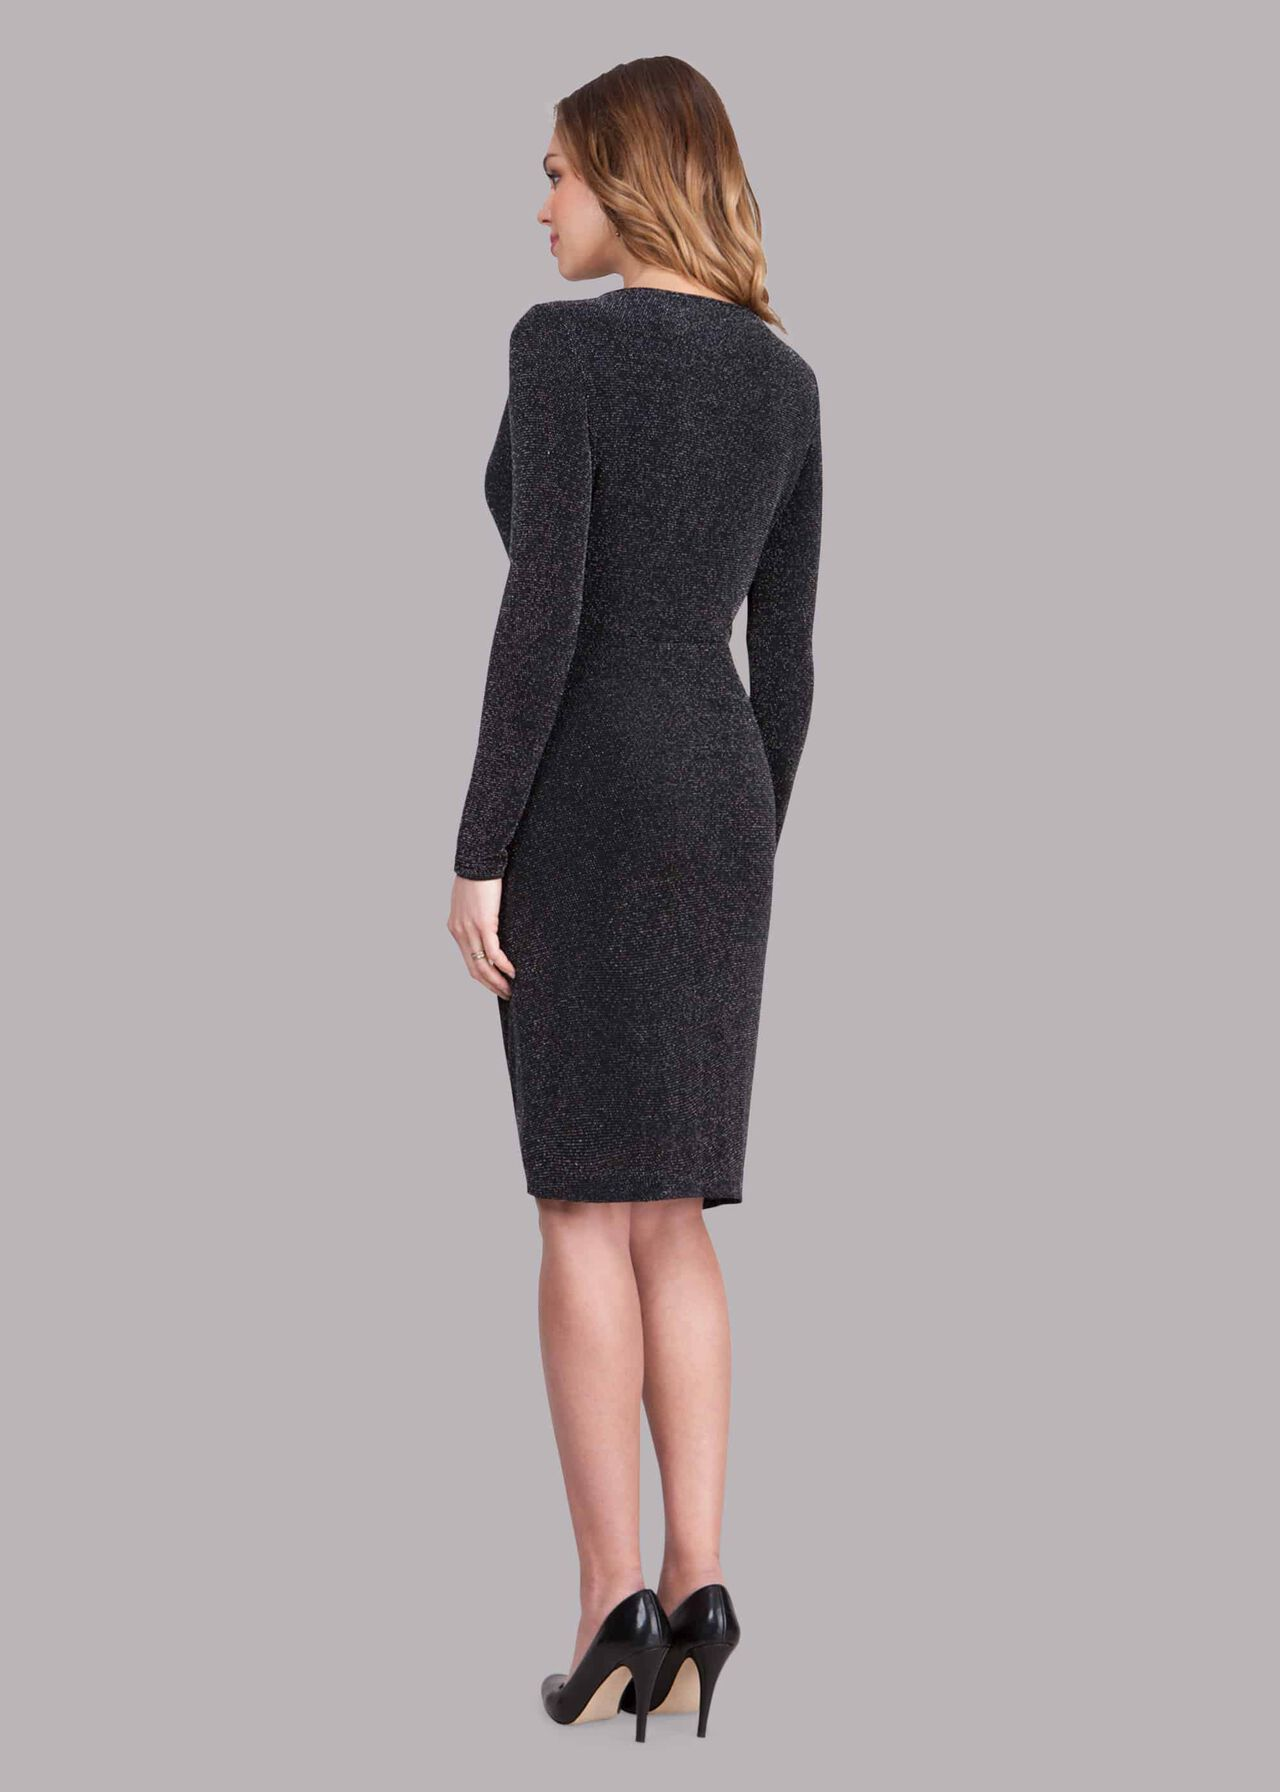 Florence Sparkle Party Dress